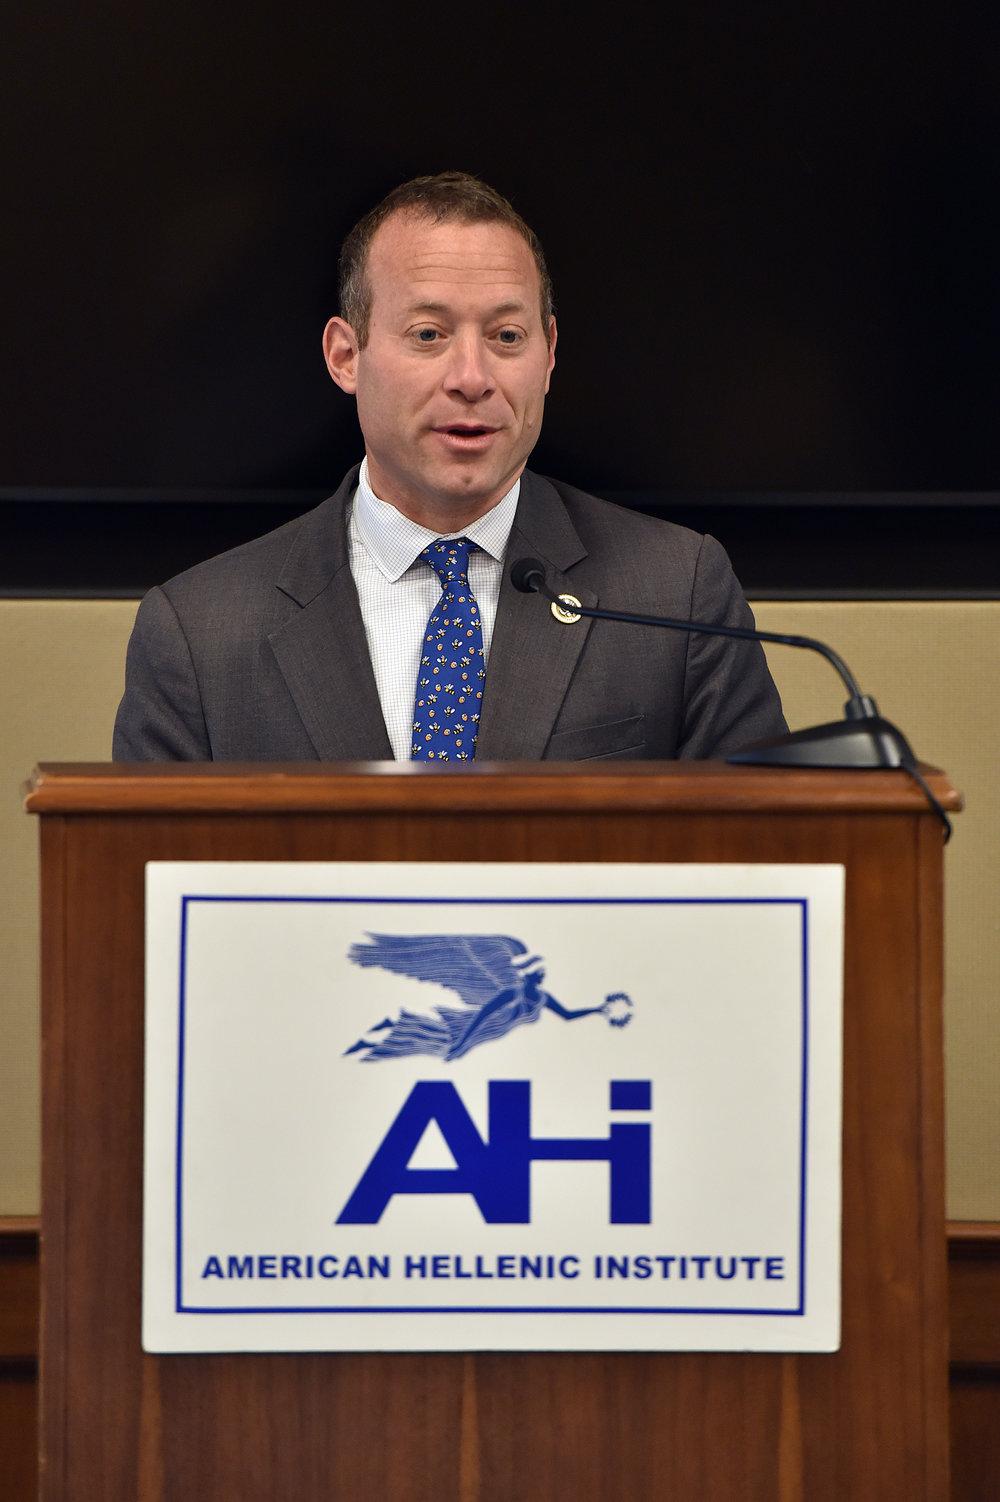 Rep. Josh Gottheimer (D-NJ)